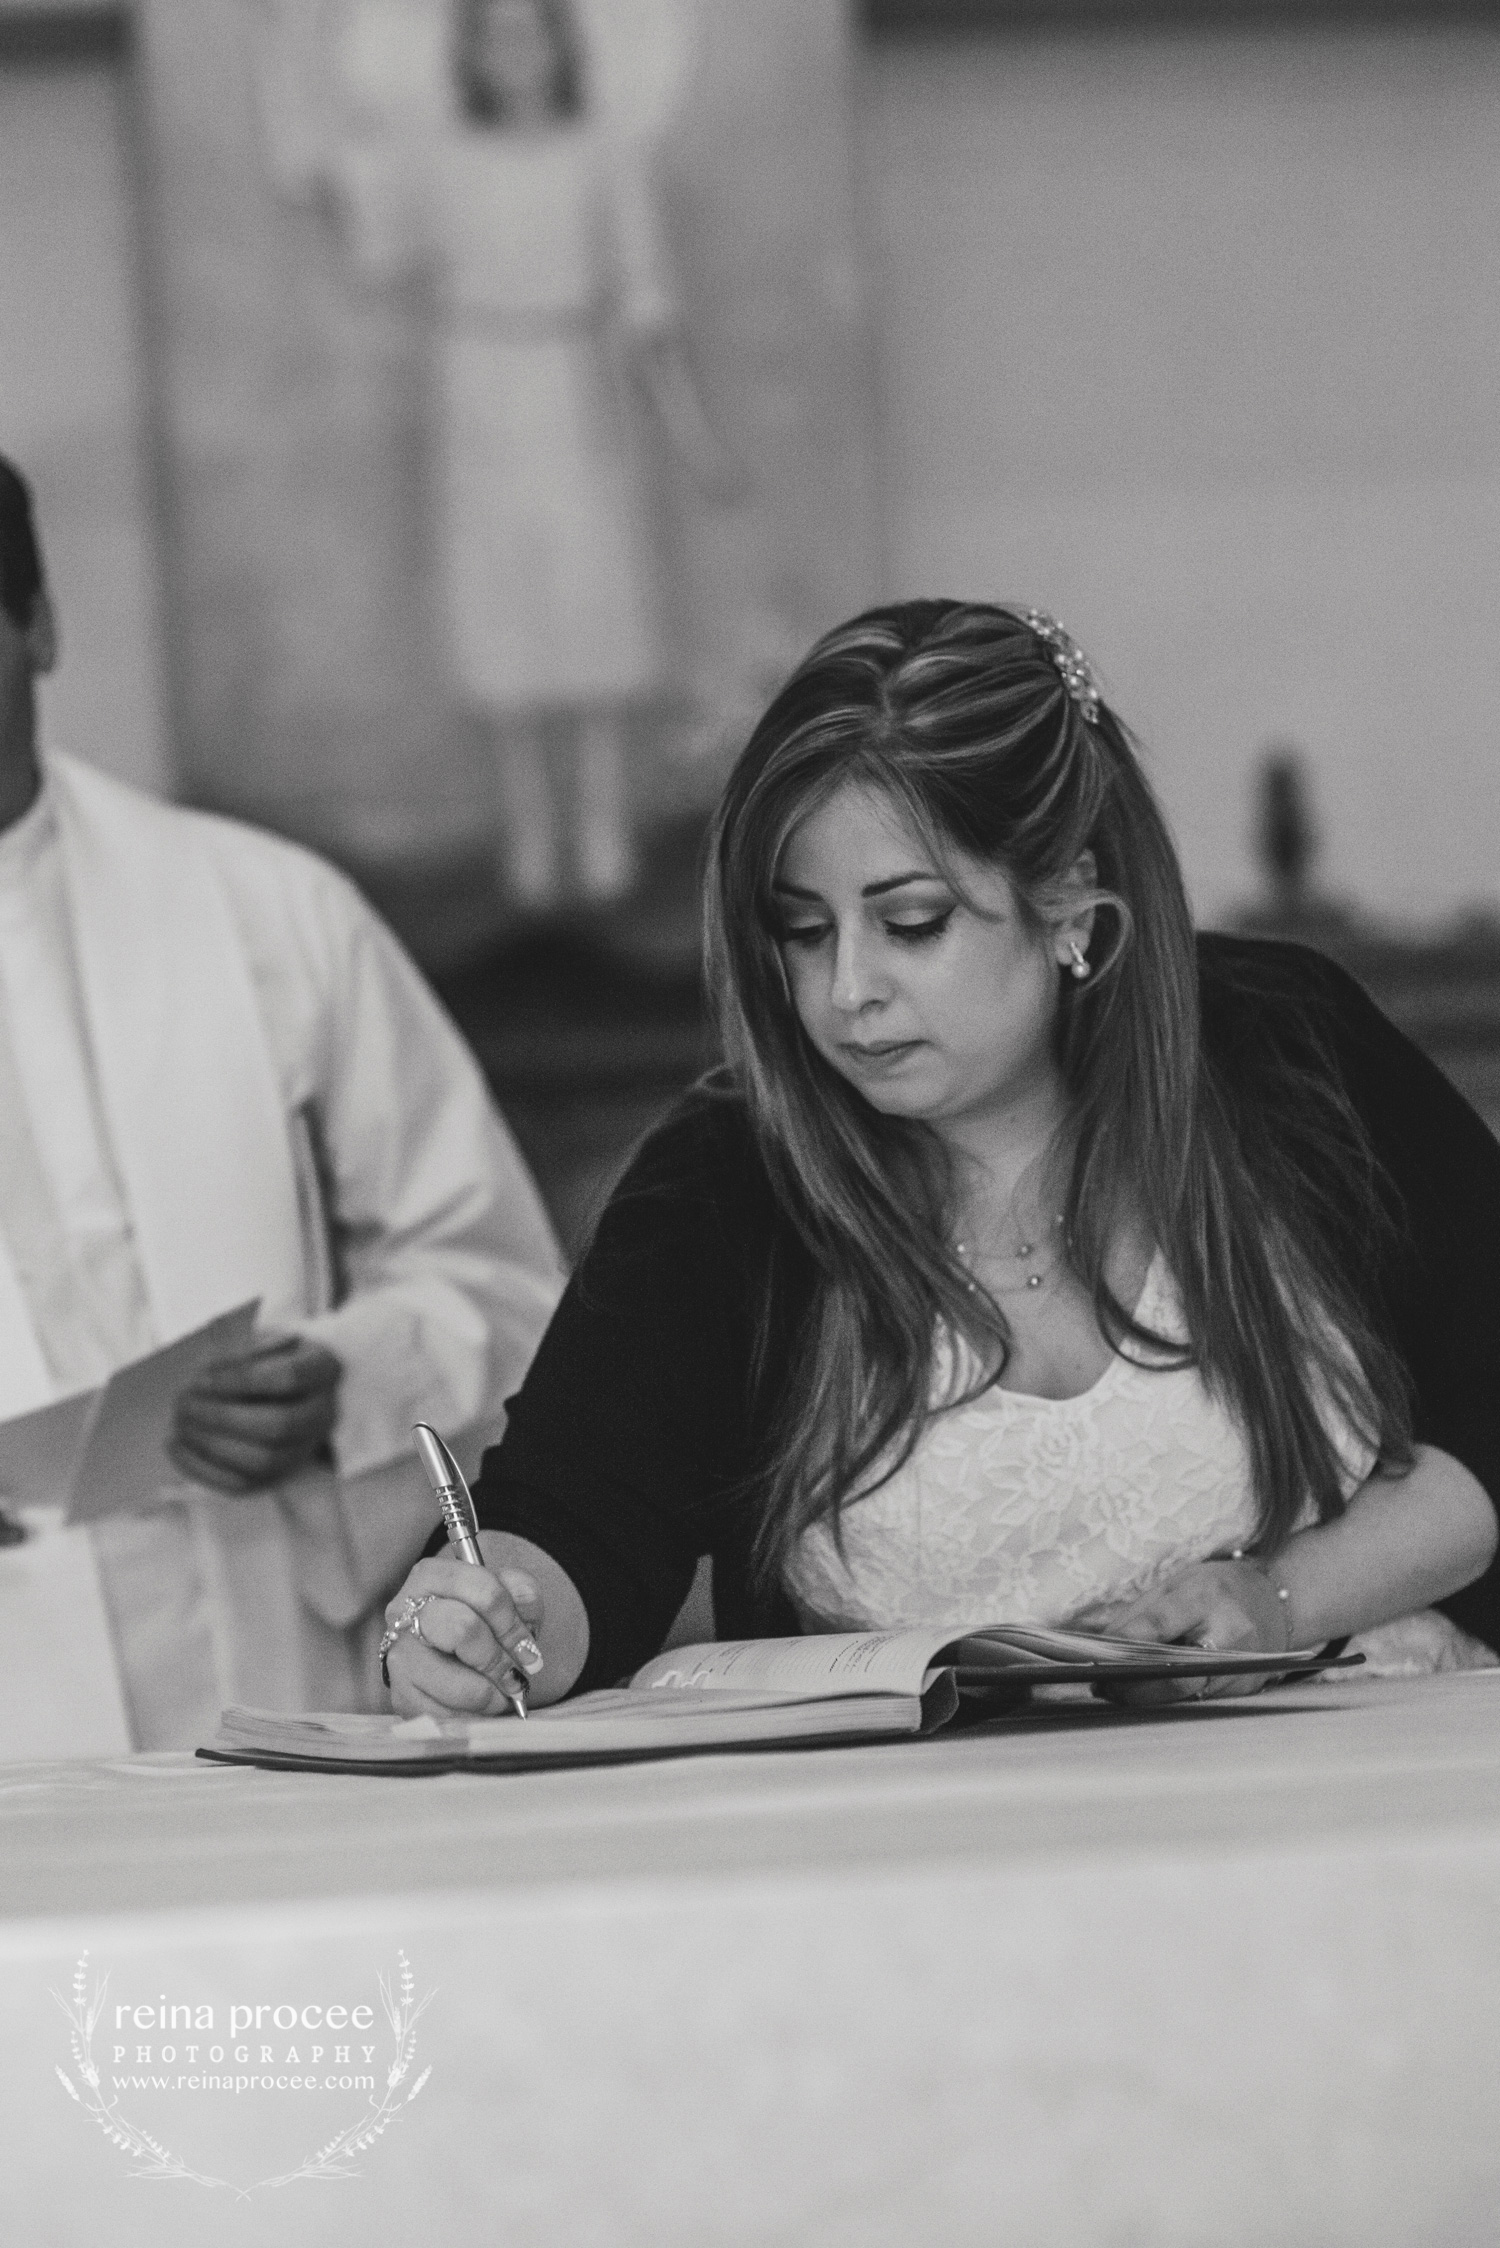 053-baptism-photographer-montreal-family-best-photos-portraits.jpg